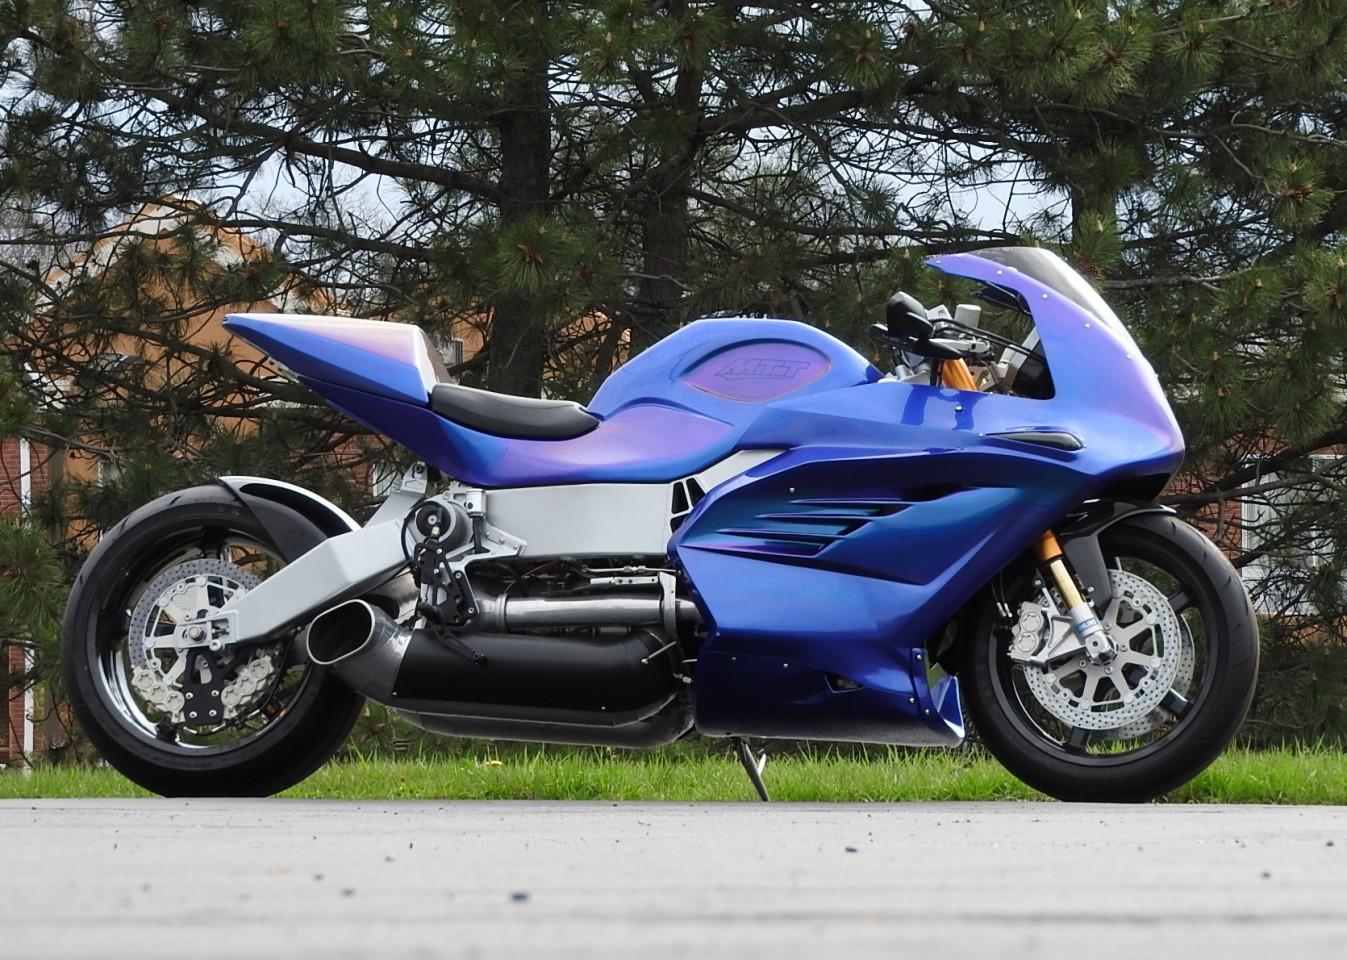 The MTT 420 RR turbine superbike